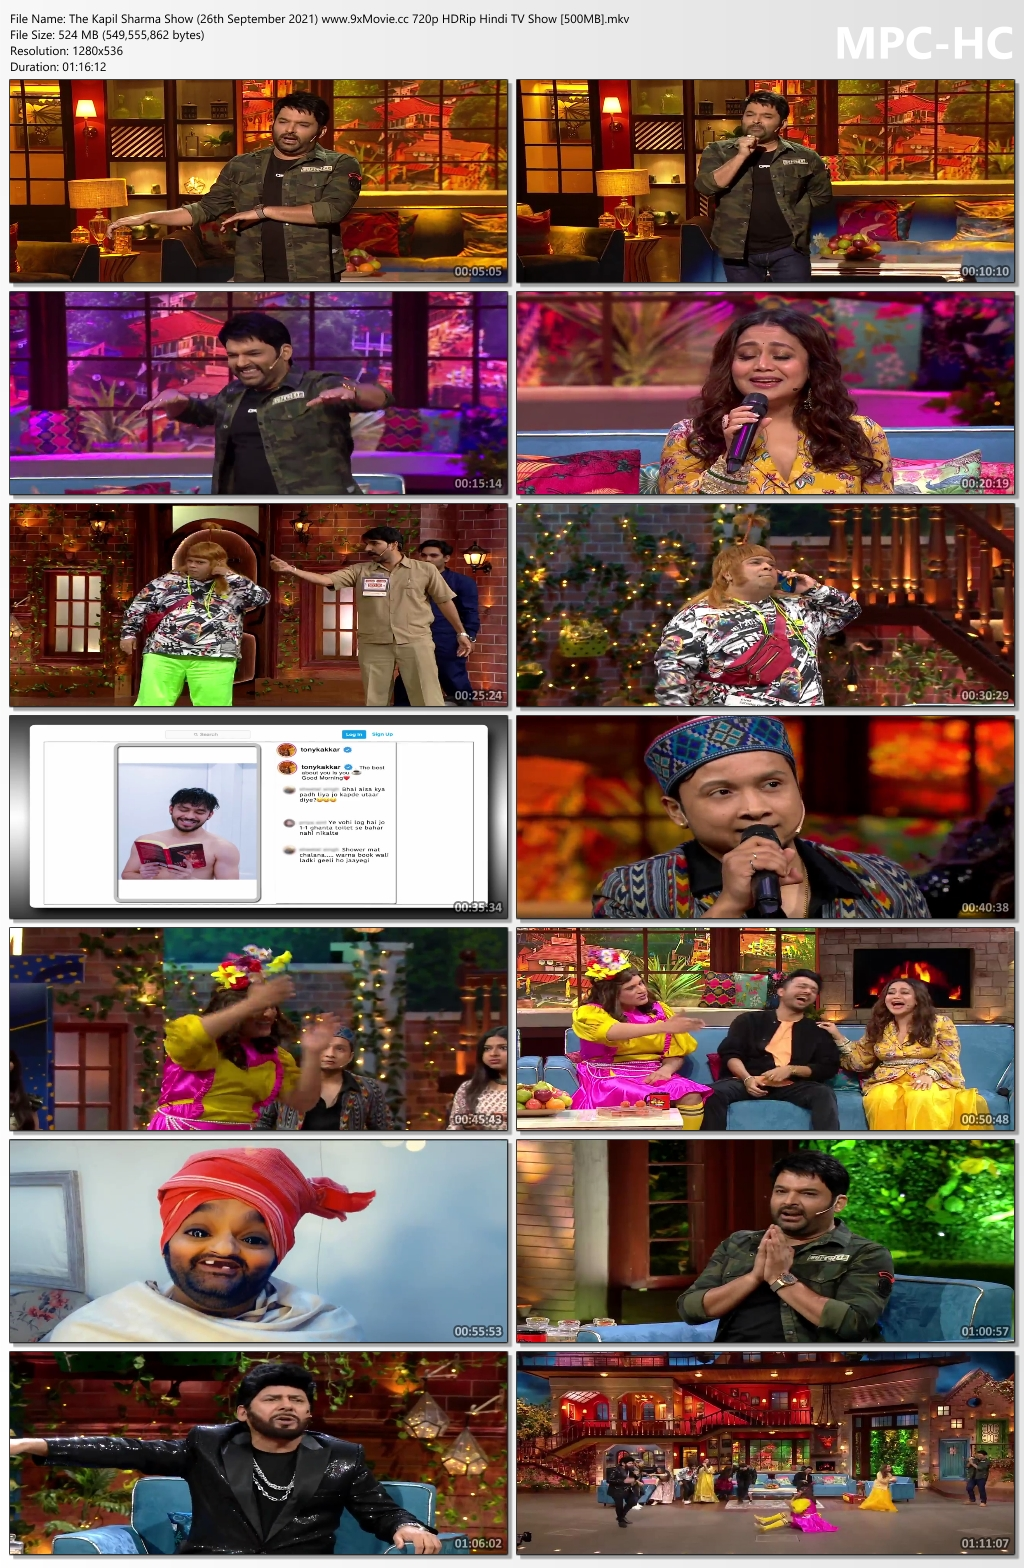 The-Kapil-Sharma-Show-26th-September-2021-www-9x-Movie-cc-720p-HDRip-Hindi-TV-Show-500-MB-mkv